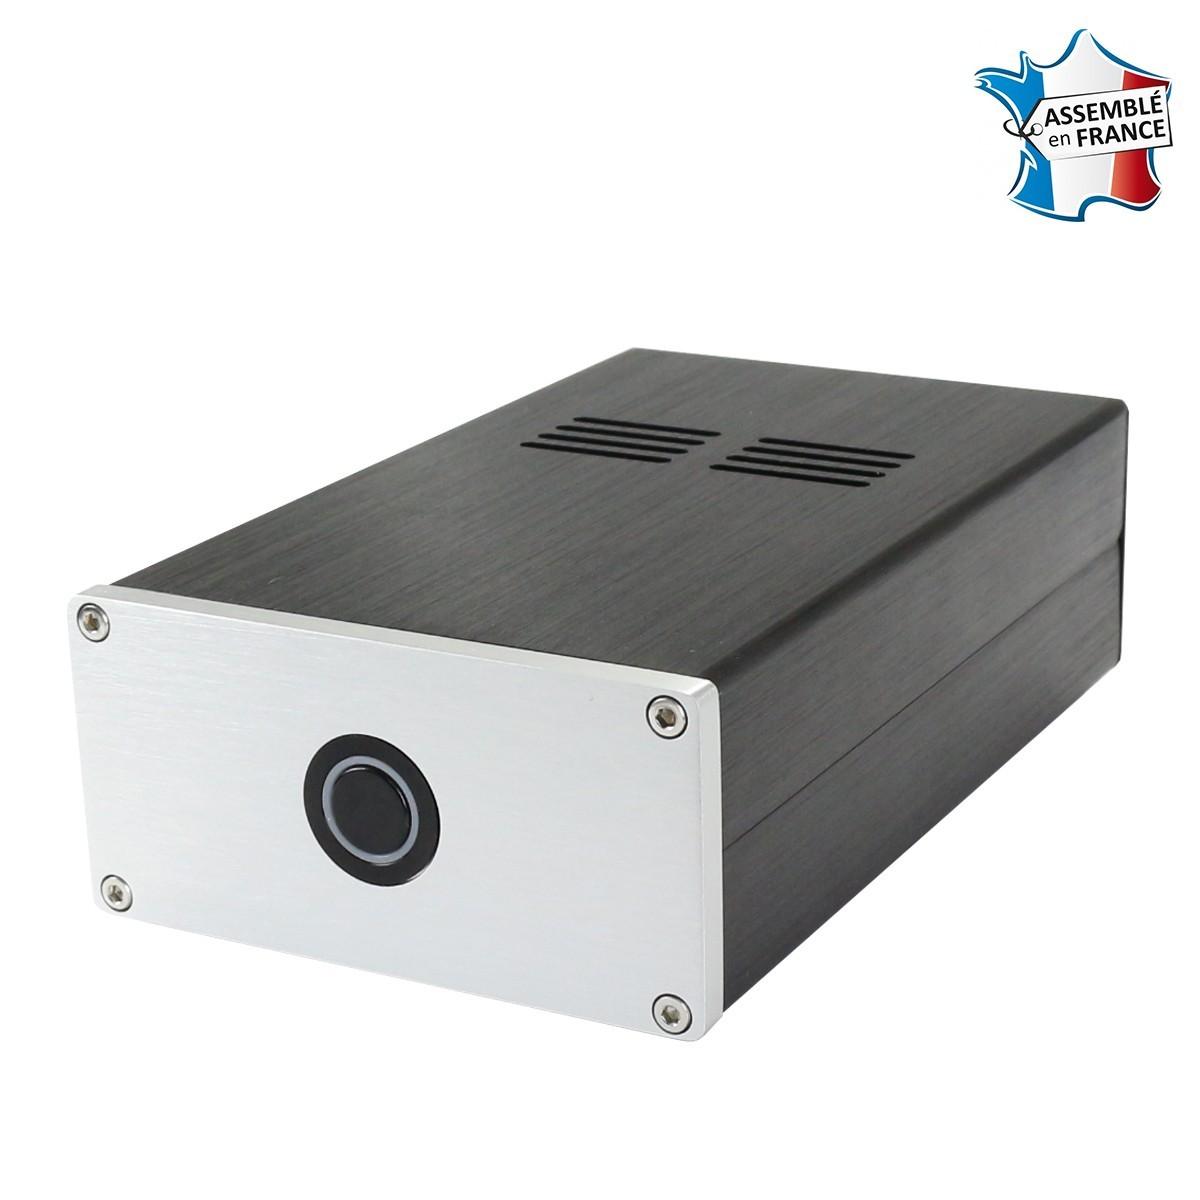 AUDIOPHONICS RASPDAC LTE ST4000 Streamer Raspberry Pi 3 B+ & DAC ES9018K2M